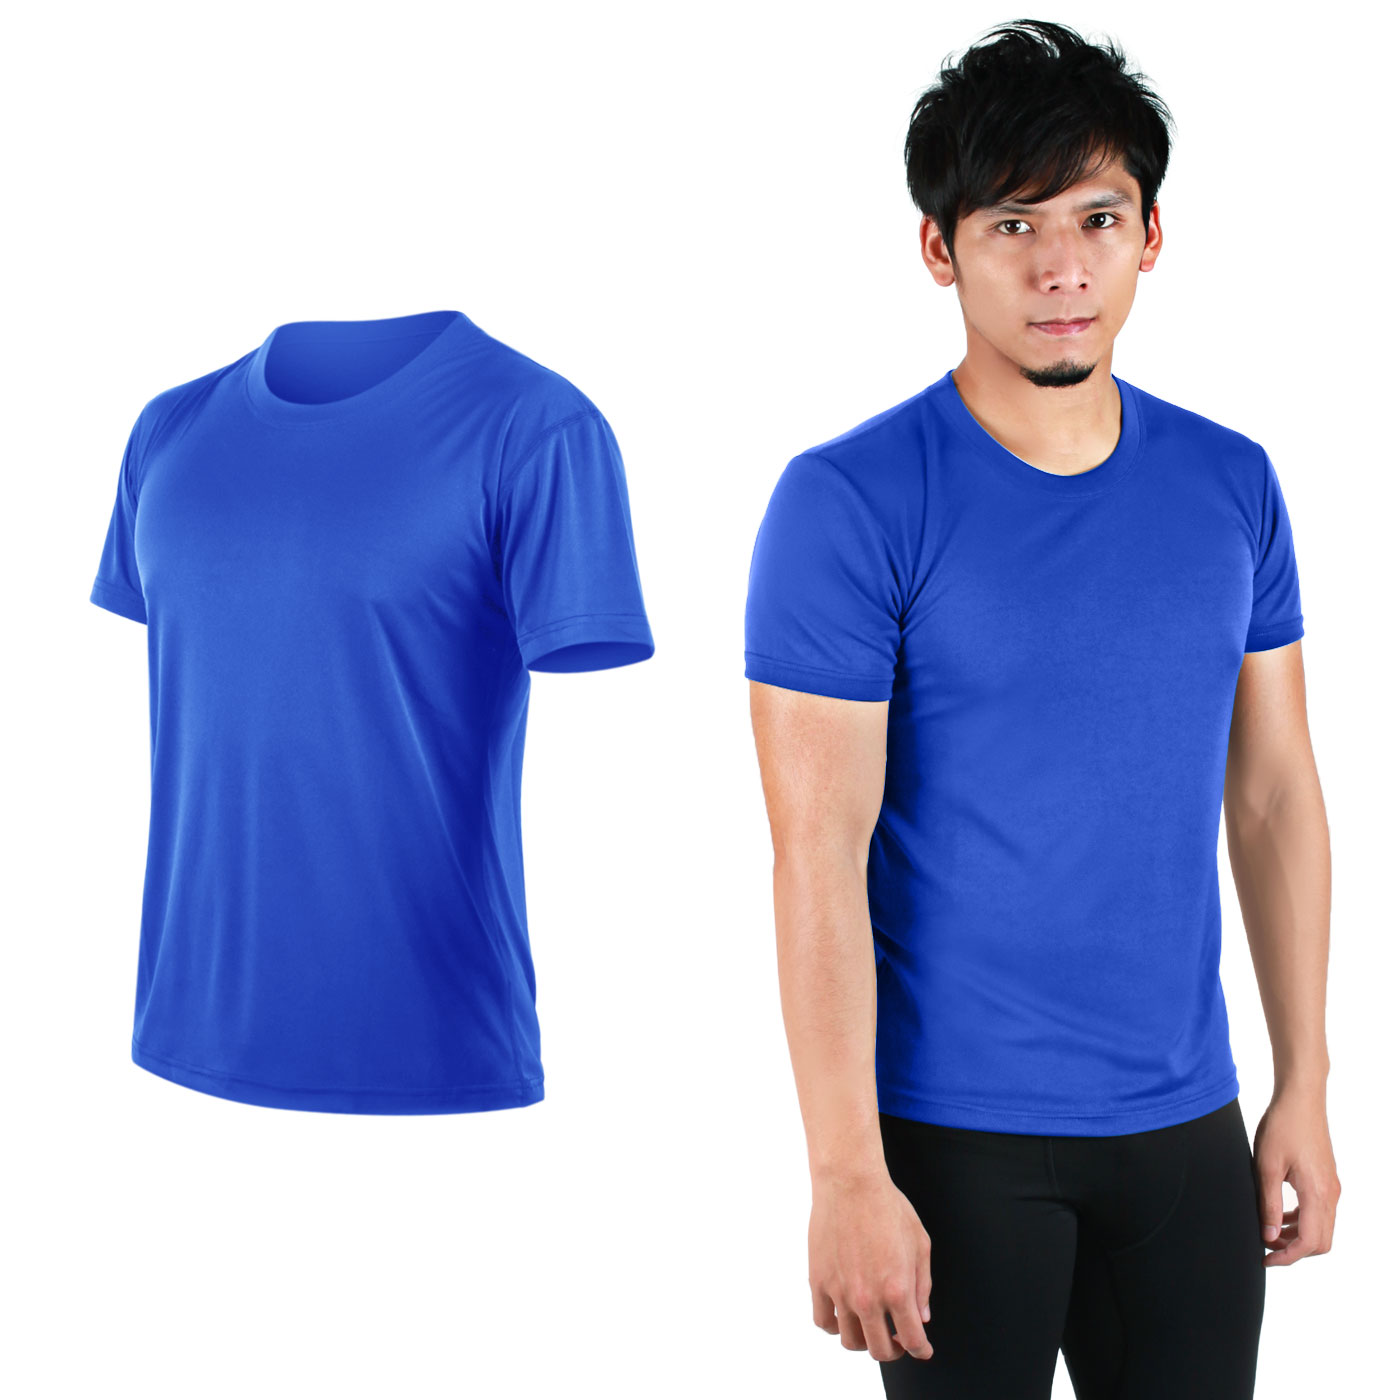 HODARLA FLARE 100 吸濕排汗衫3108301 - 藍